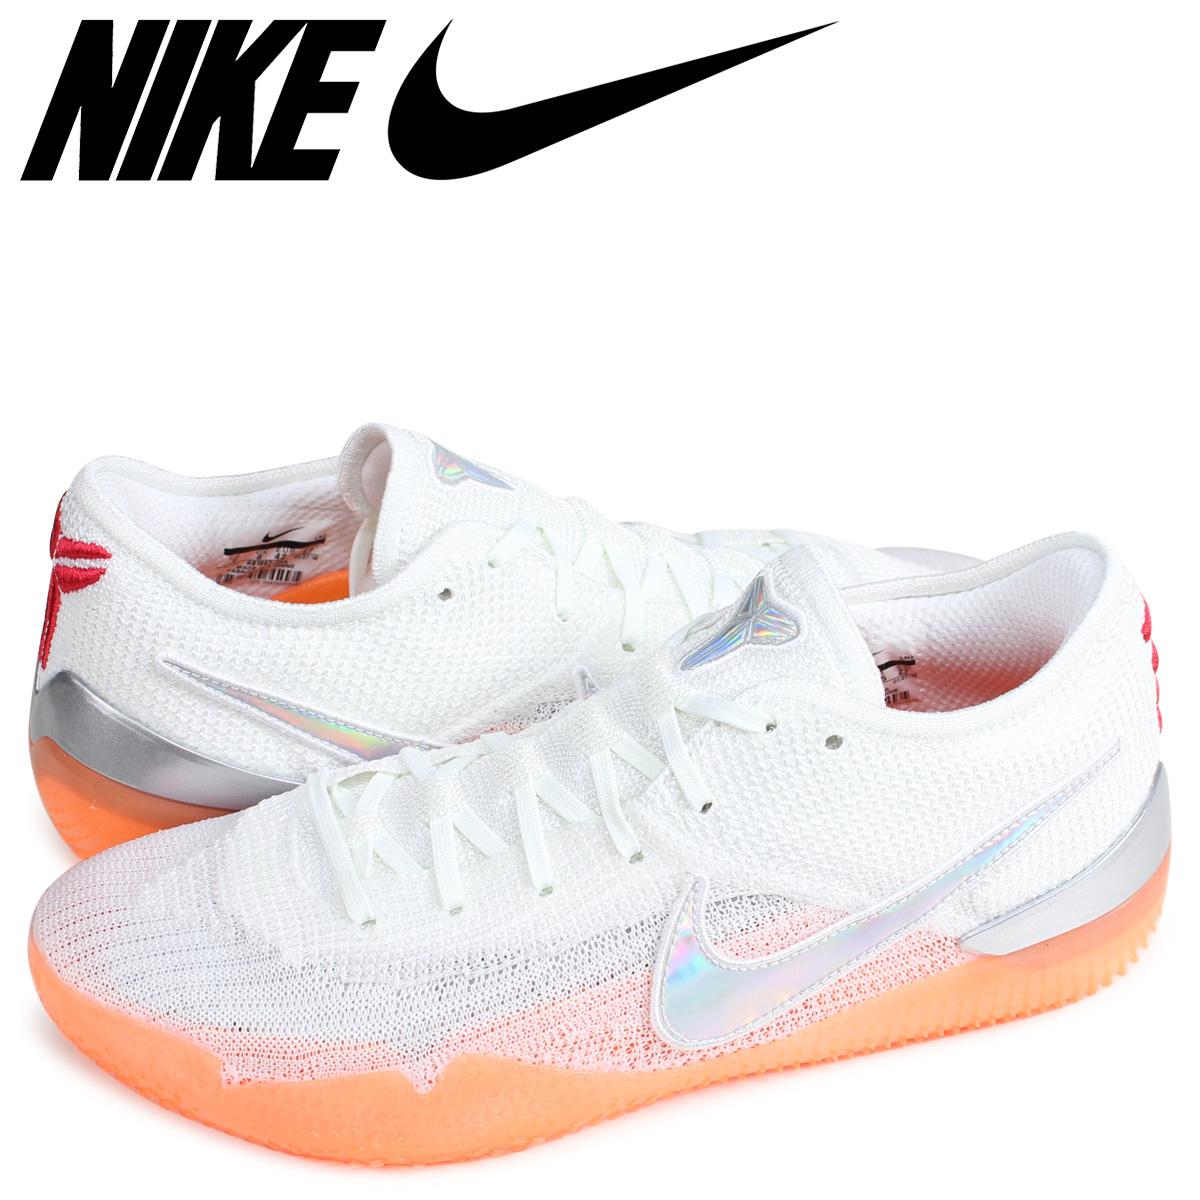 e92a244e53 Sugar Online Shop: NIKE Nike Corby sneakers men KOBE AD NXT 360 ...